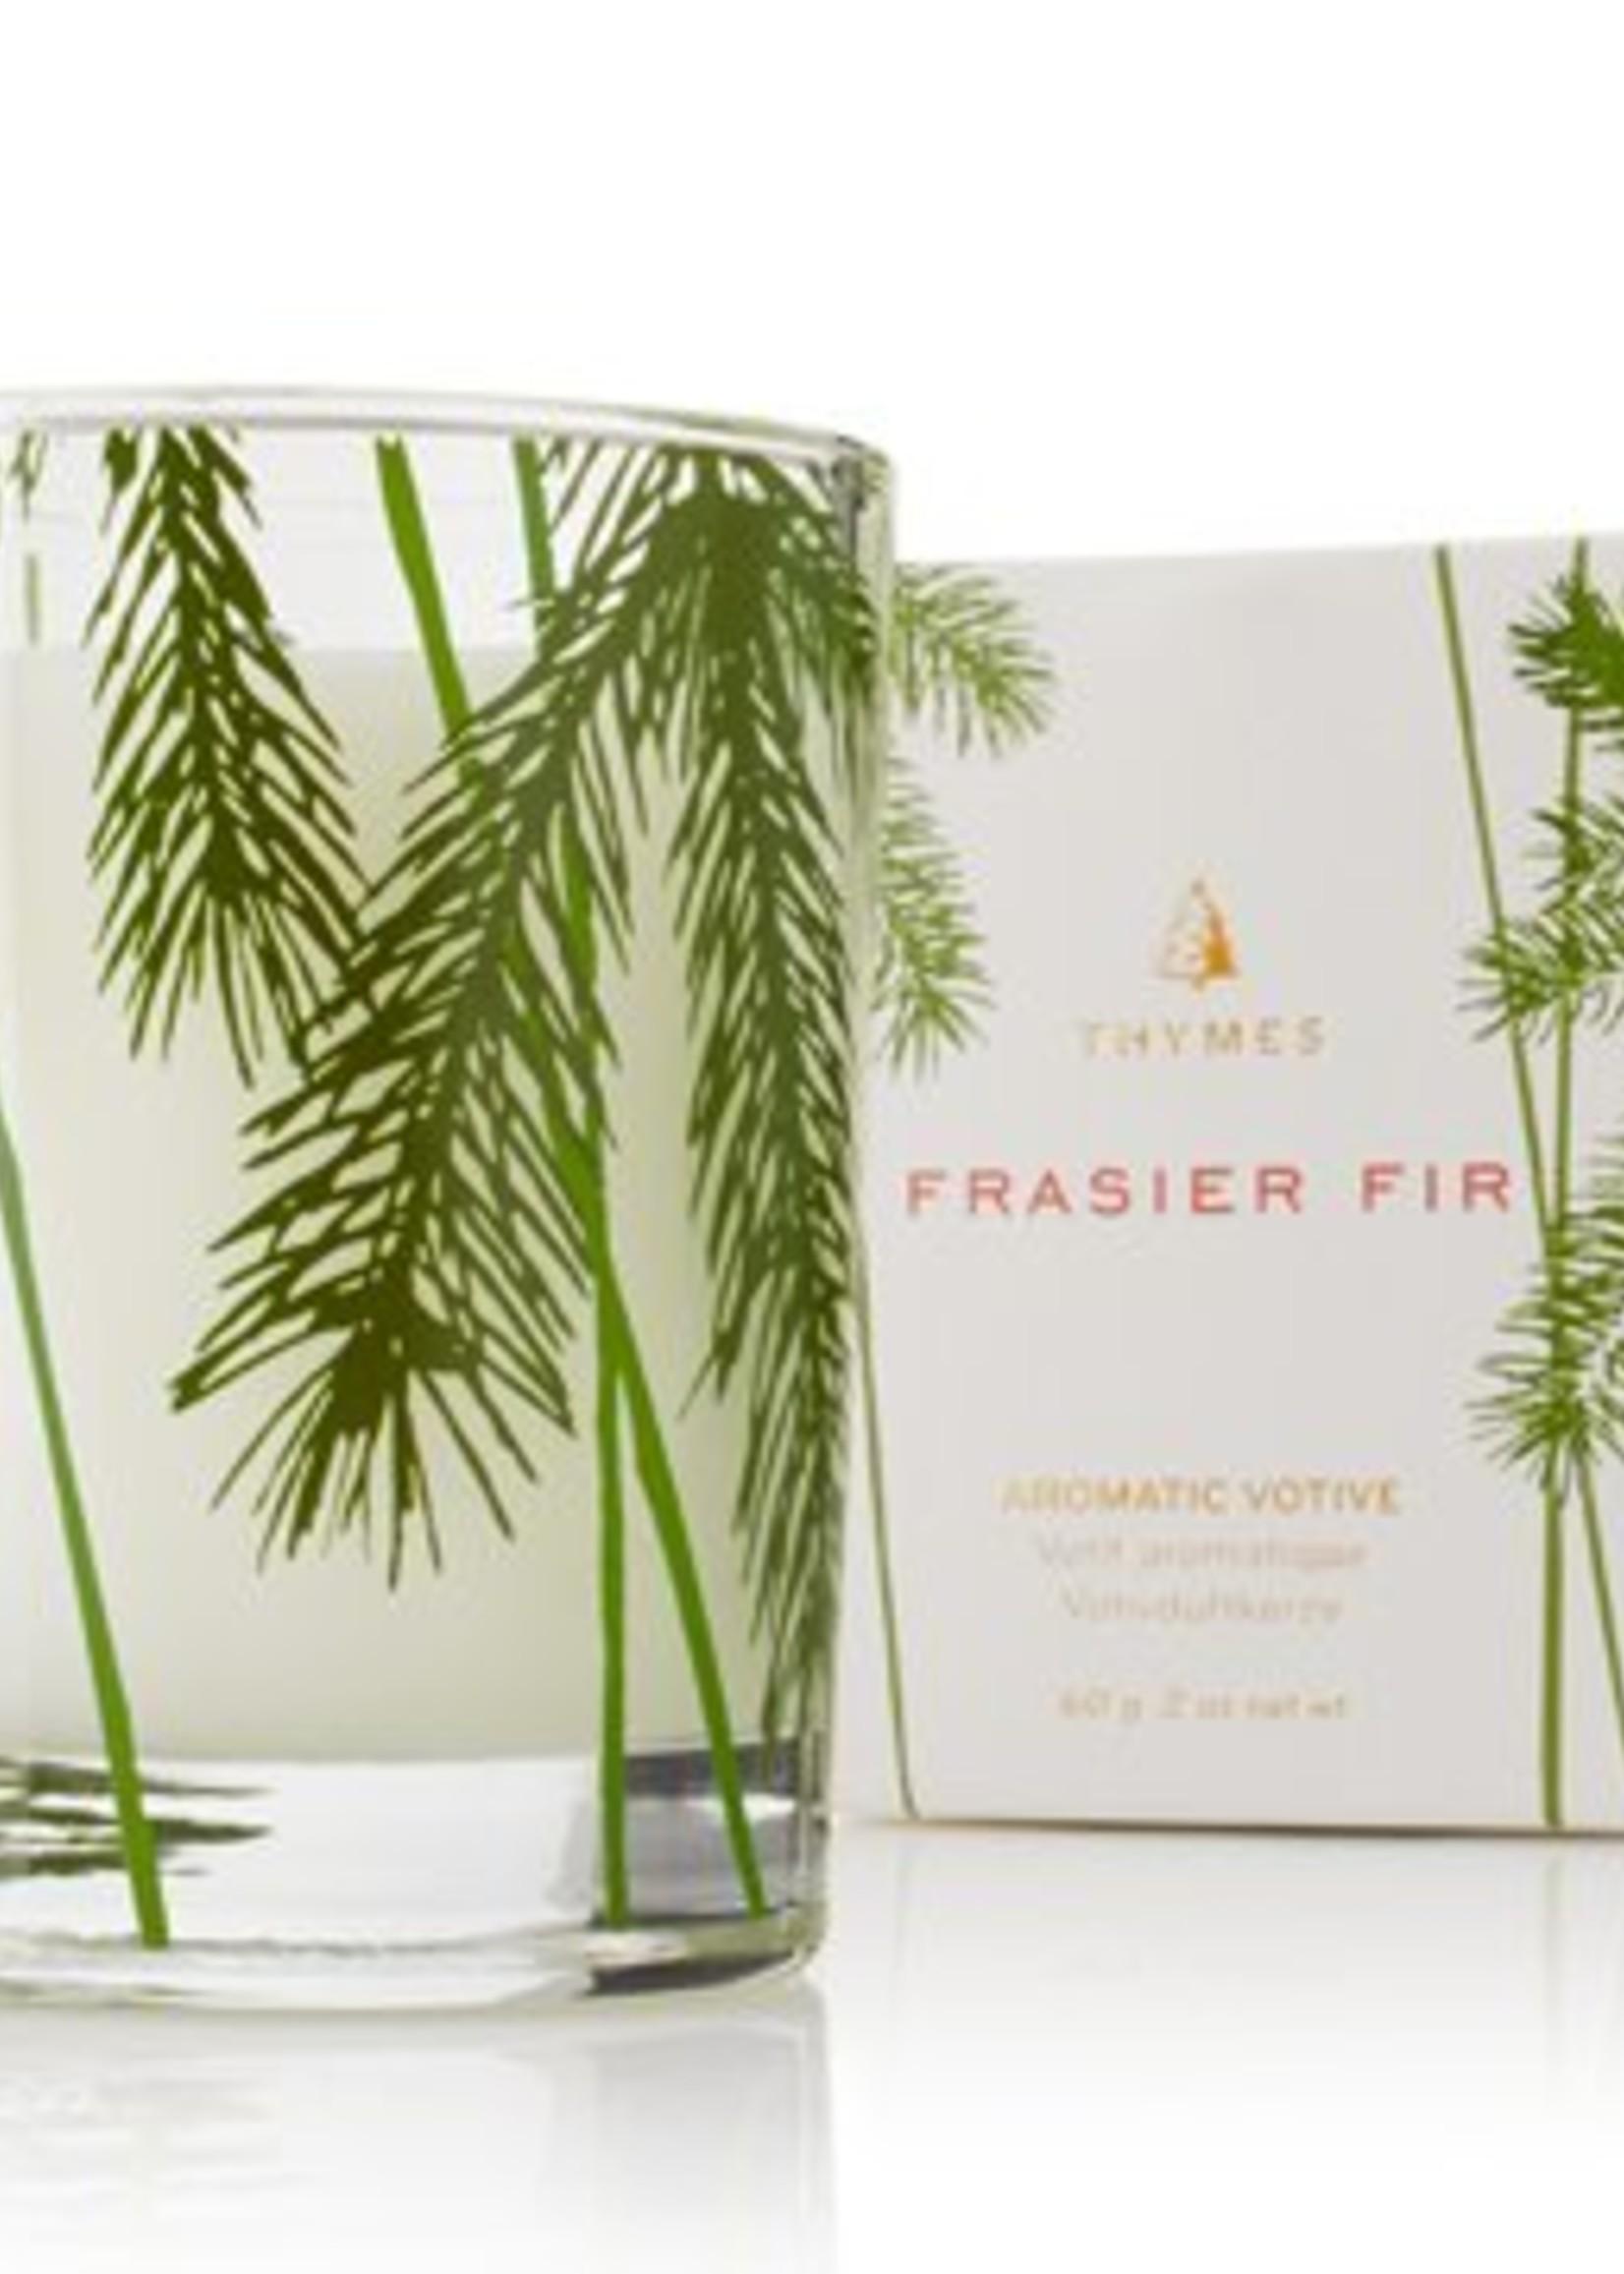 Frasier Fir Votive Candle w/ Pine Needle Design